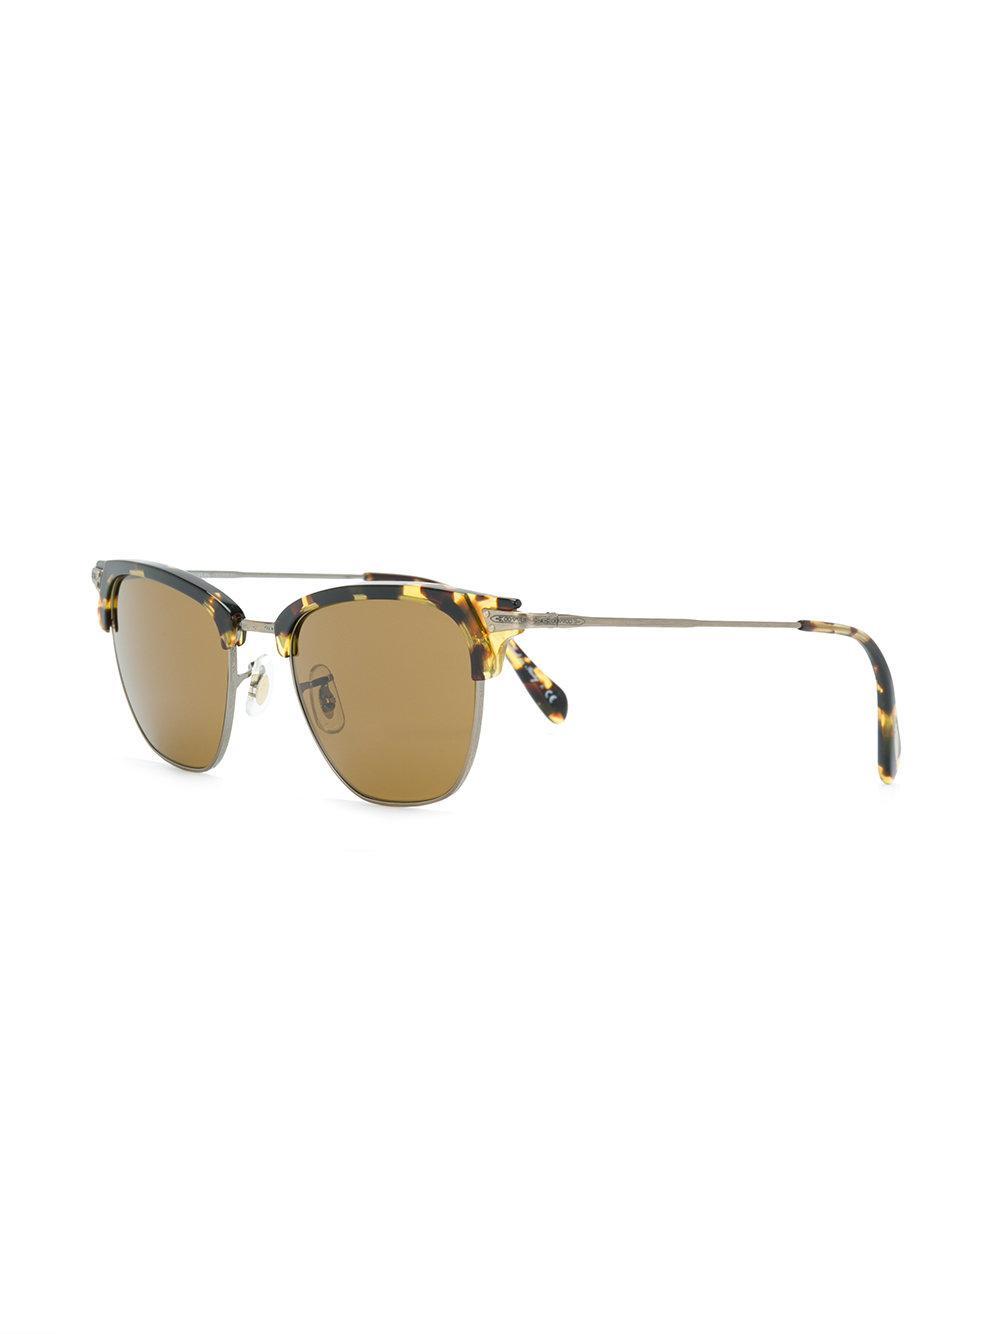 dd98267797d Oliver Peoples Tortoiseshell Half-frame Sunglasses in Brown - Lyst